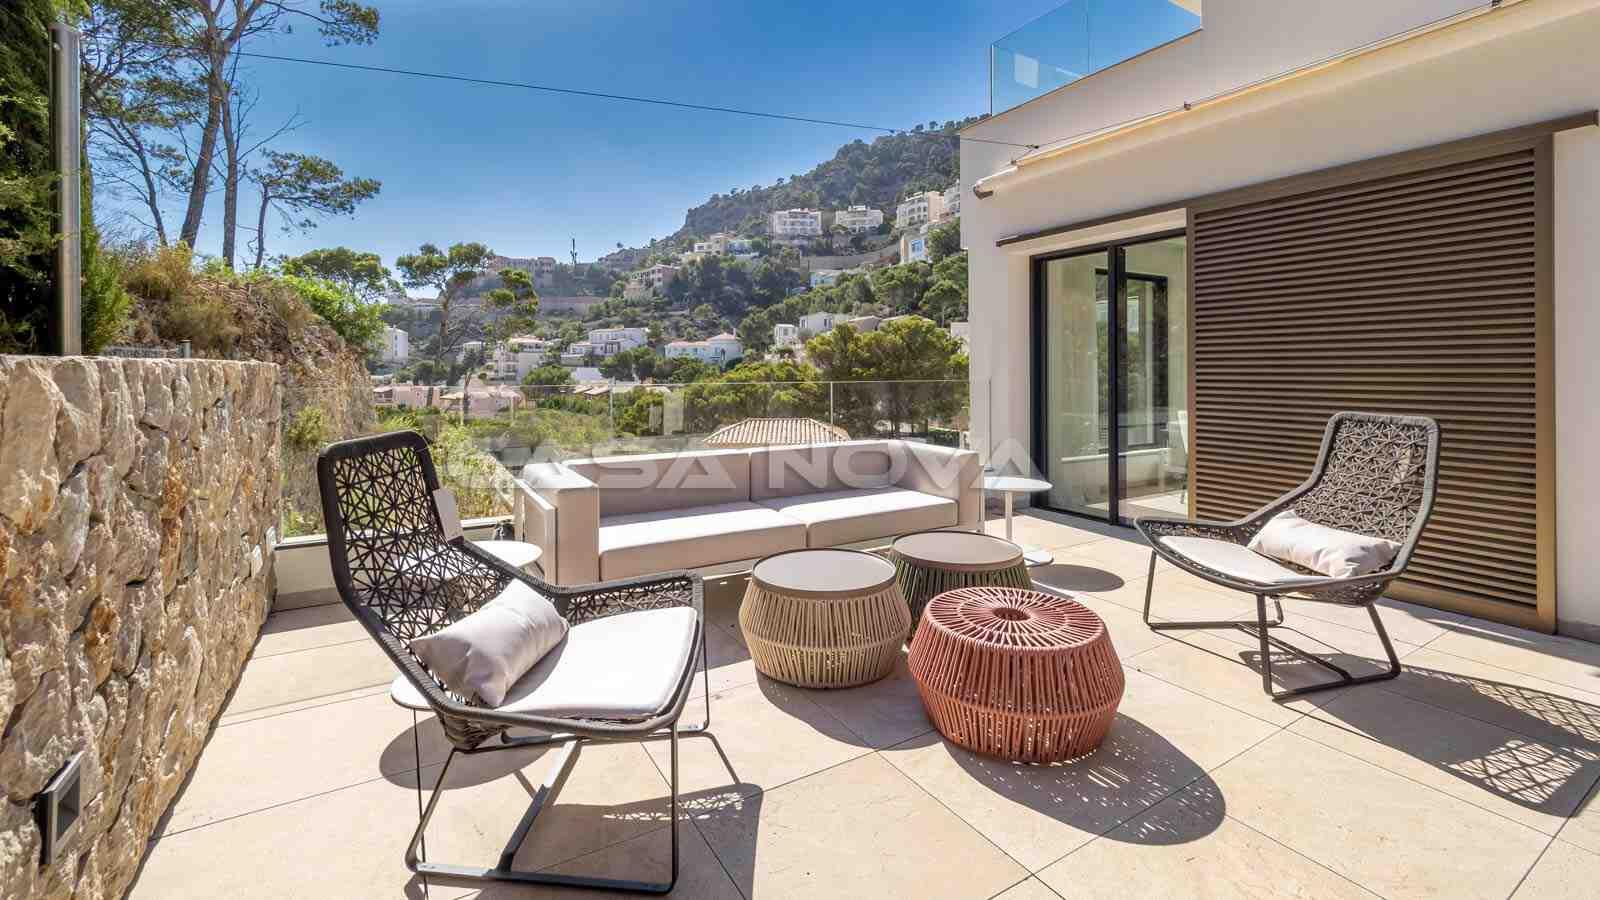 Mallorca Immobilien im Südwesten der Insel